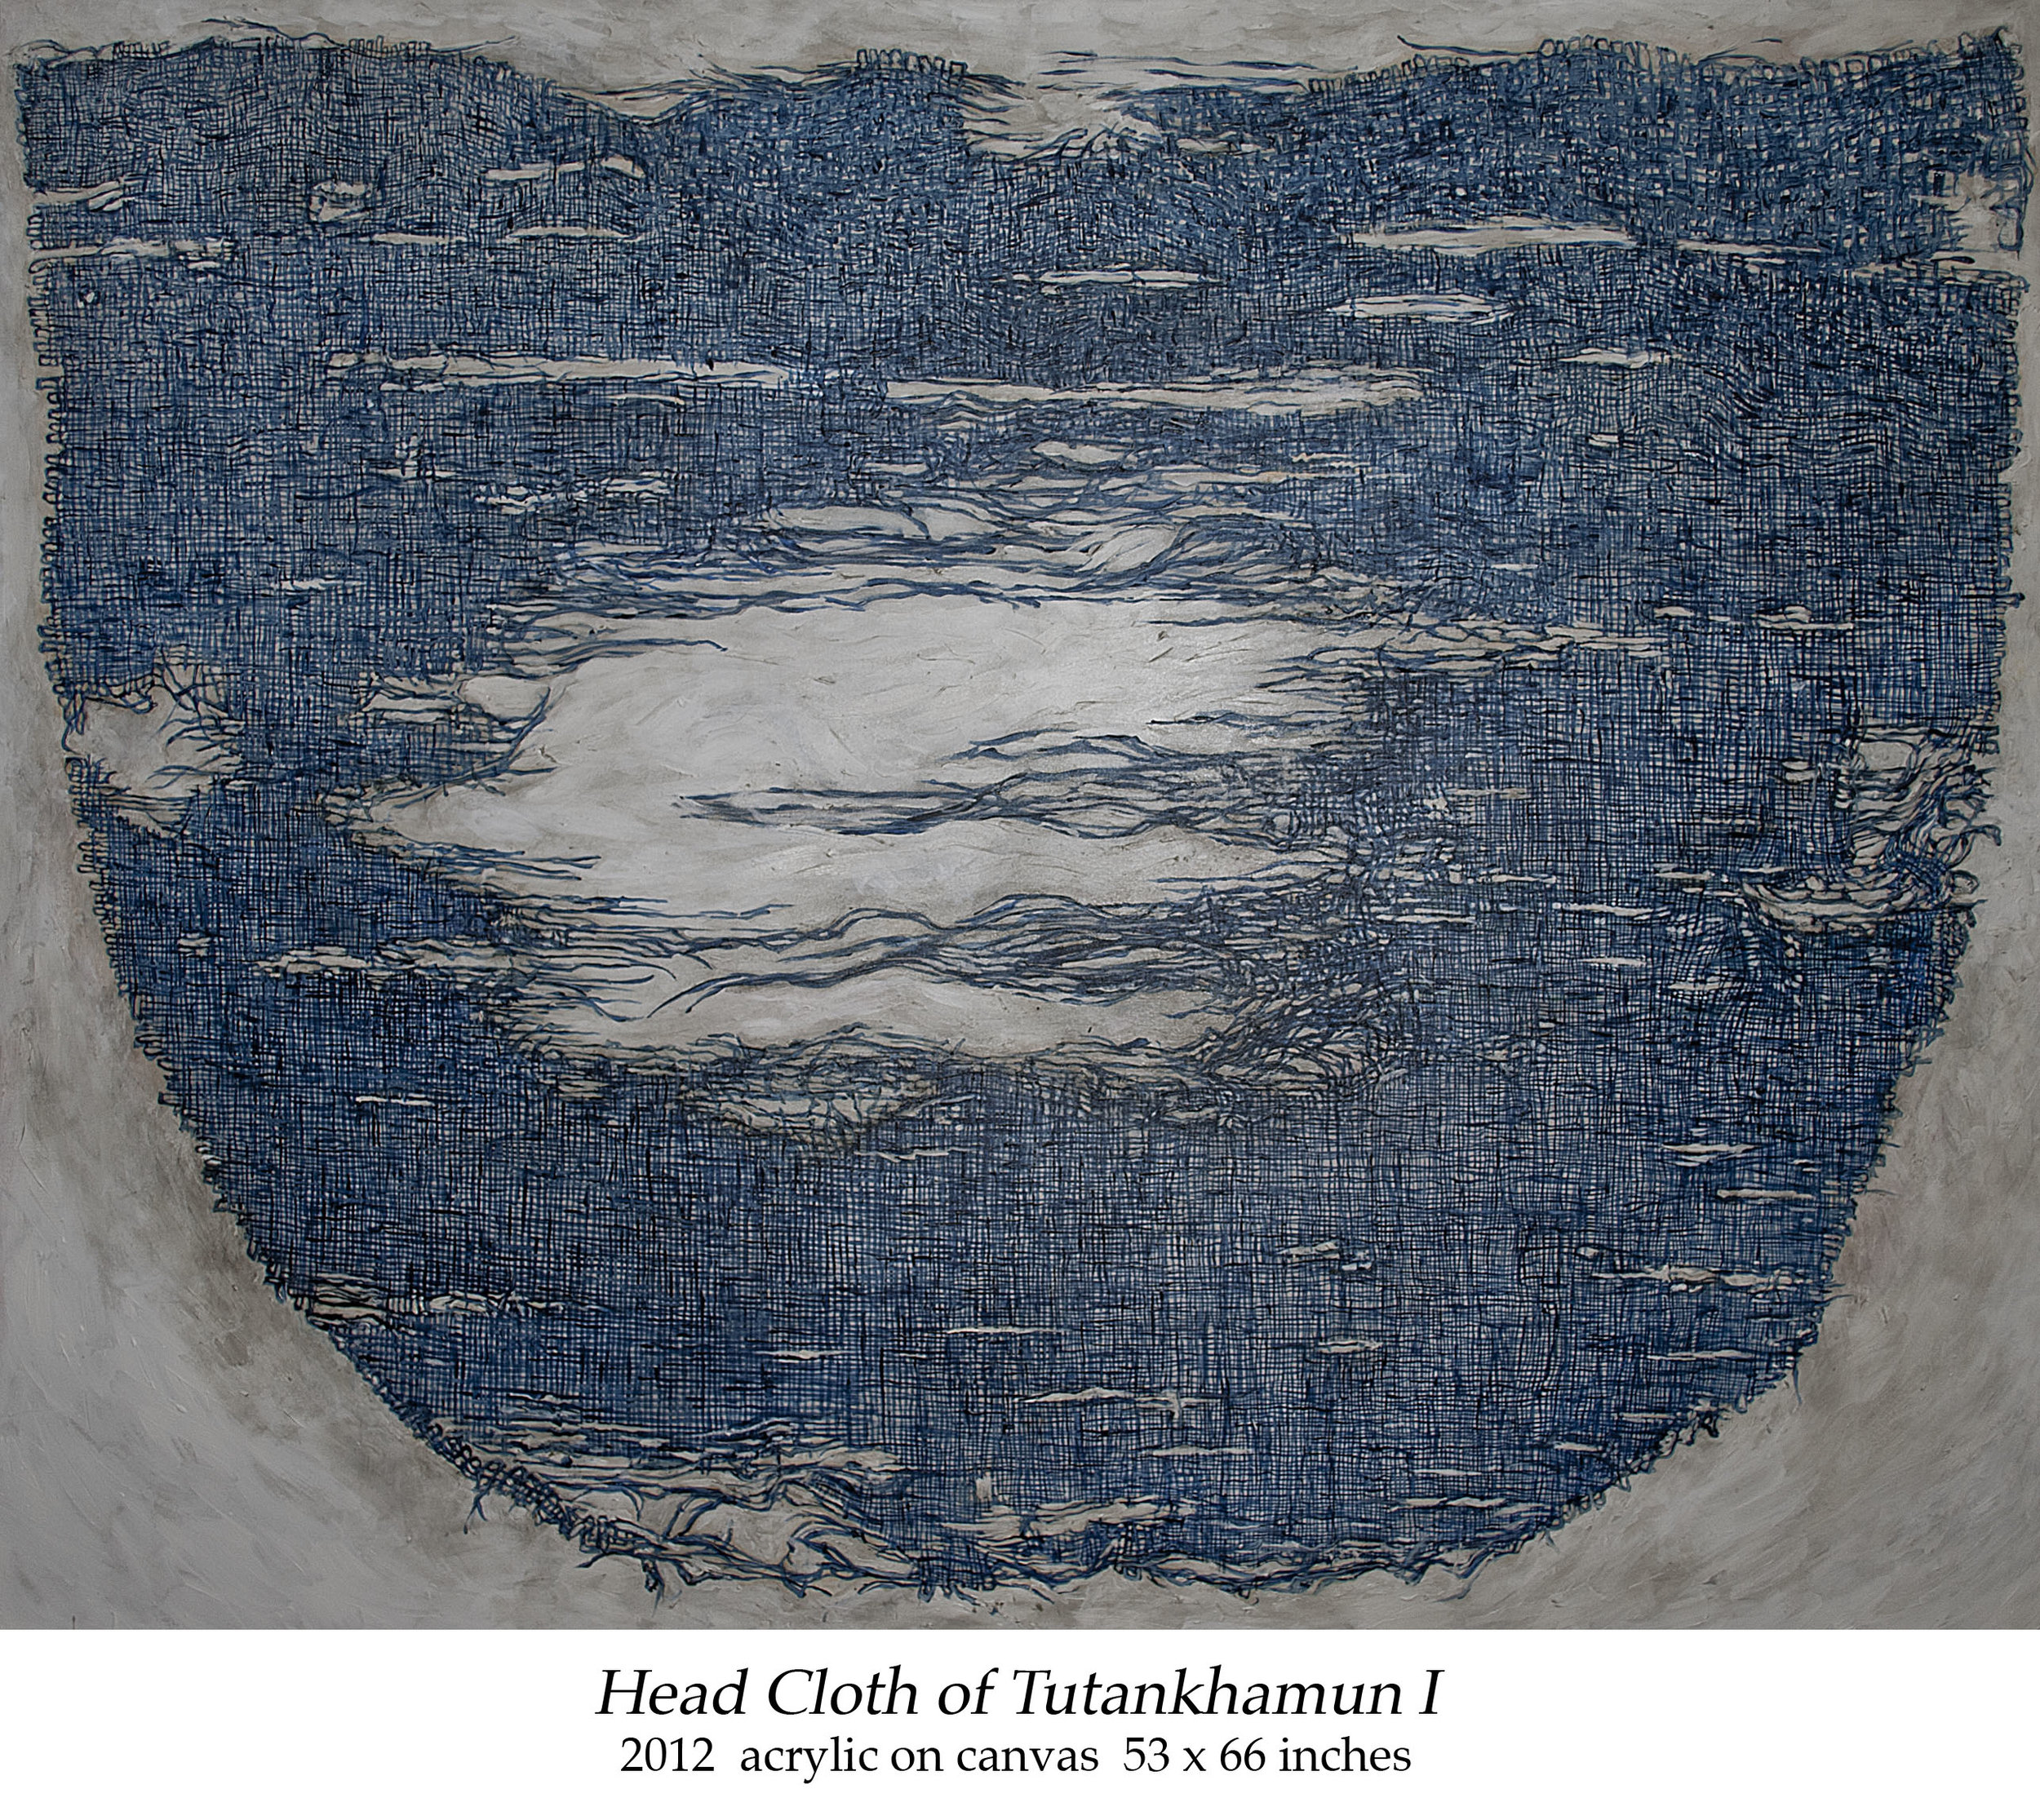 Head Cloth of Tutankhamun I 2012 acrylic on canvas 53 x 66 inches.jpg